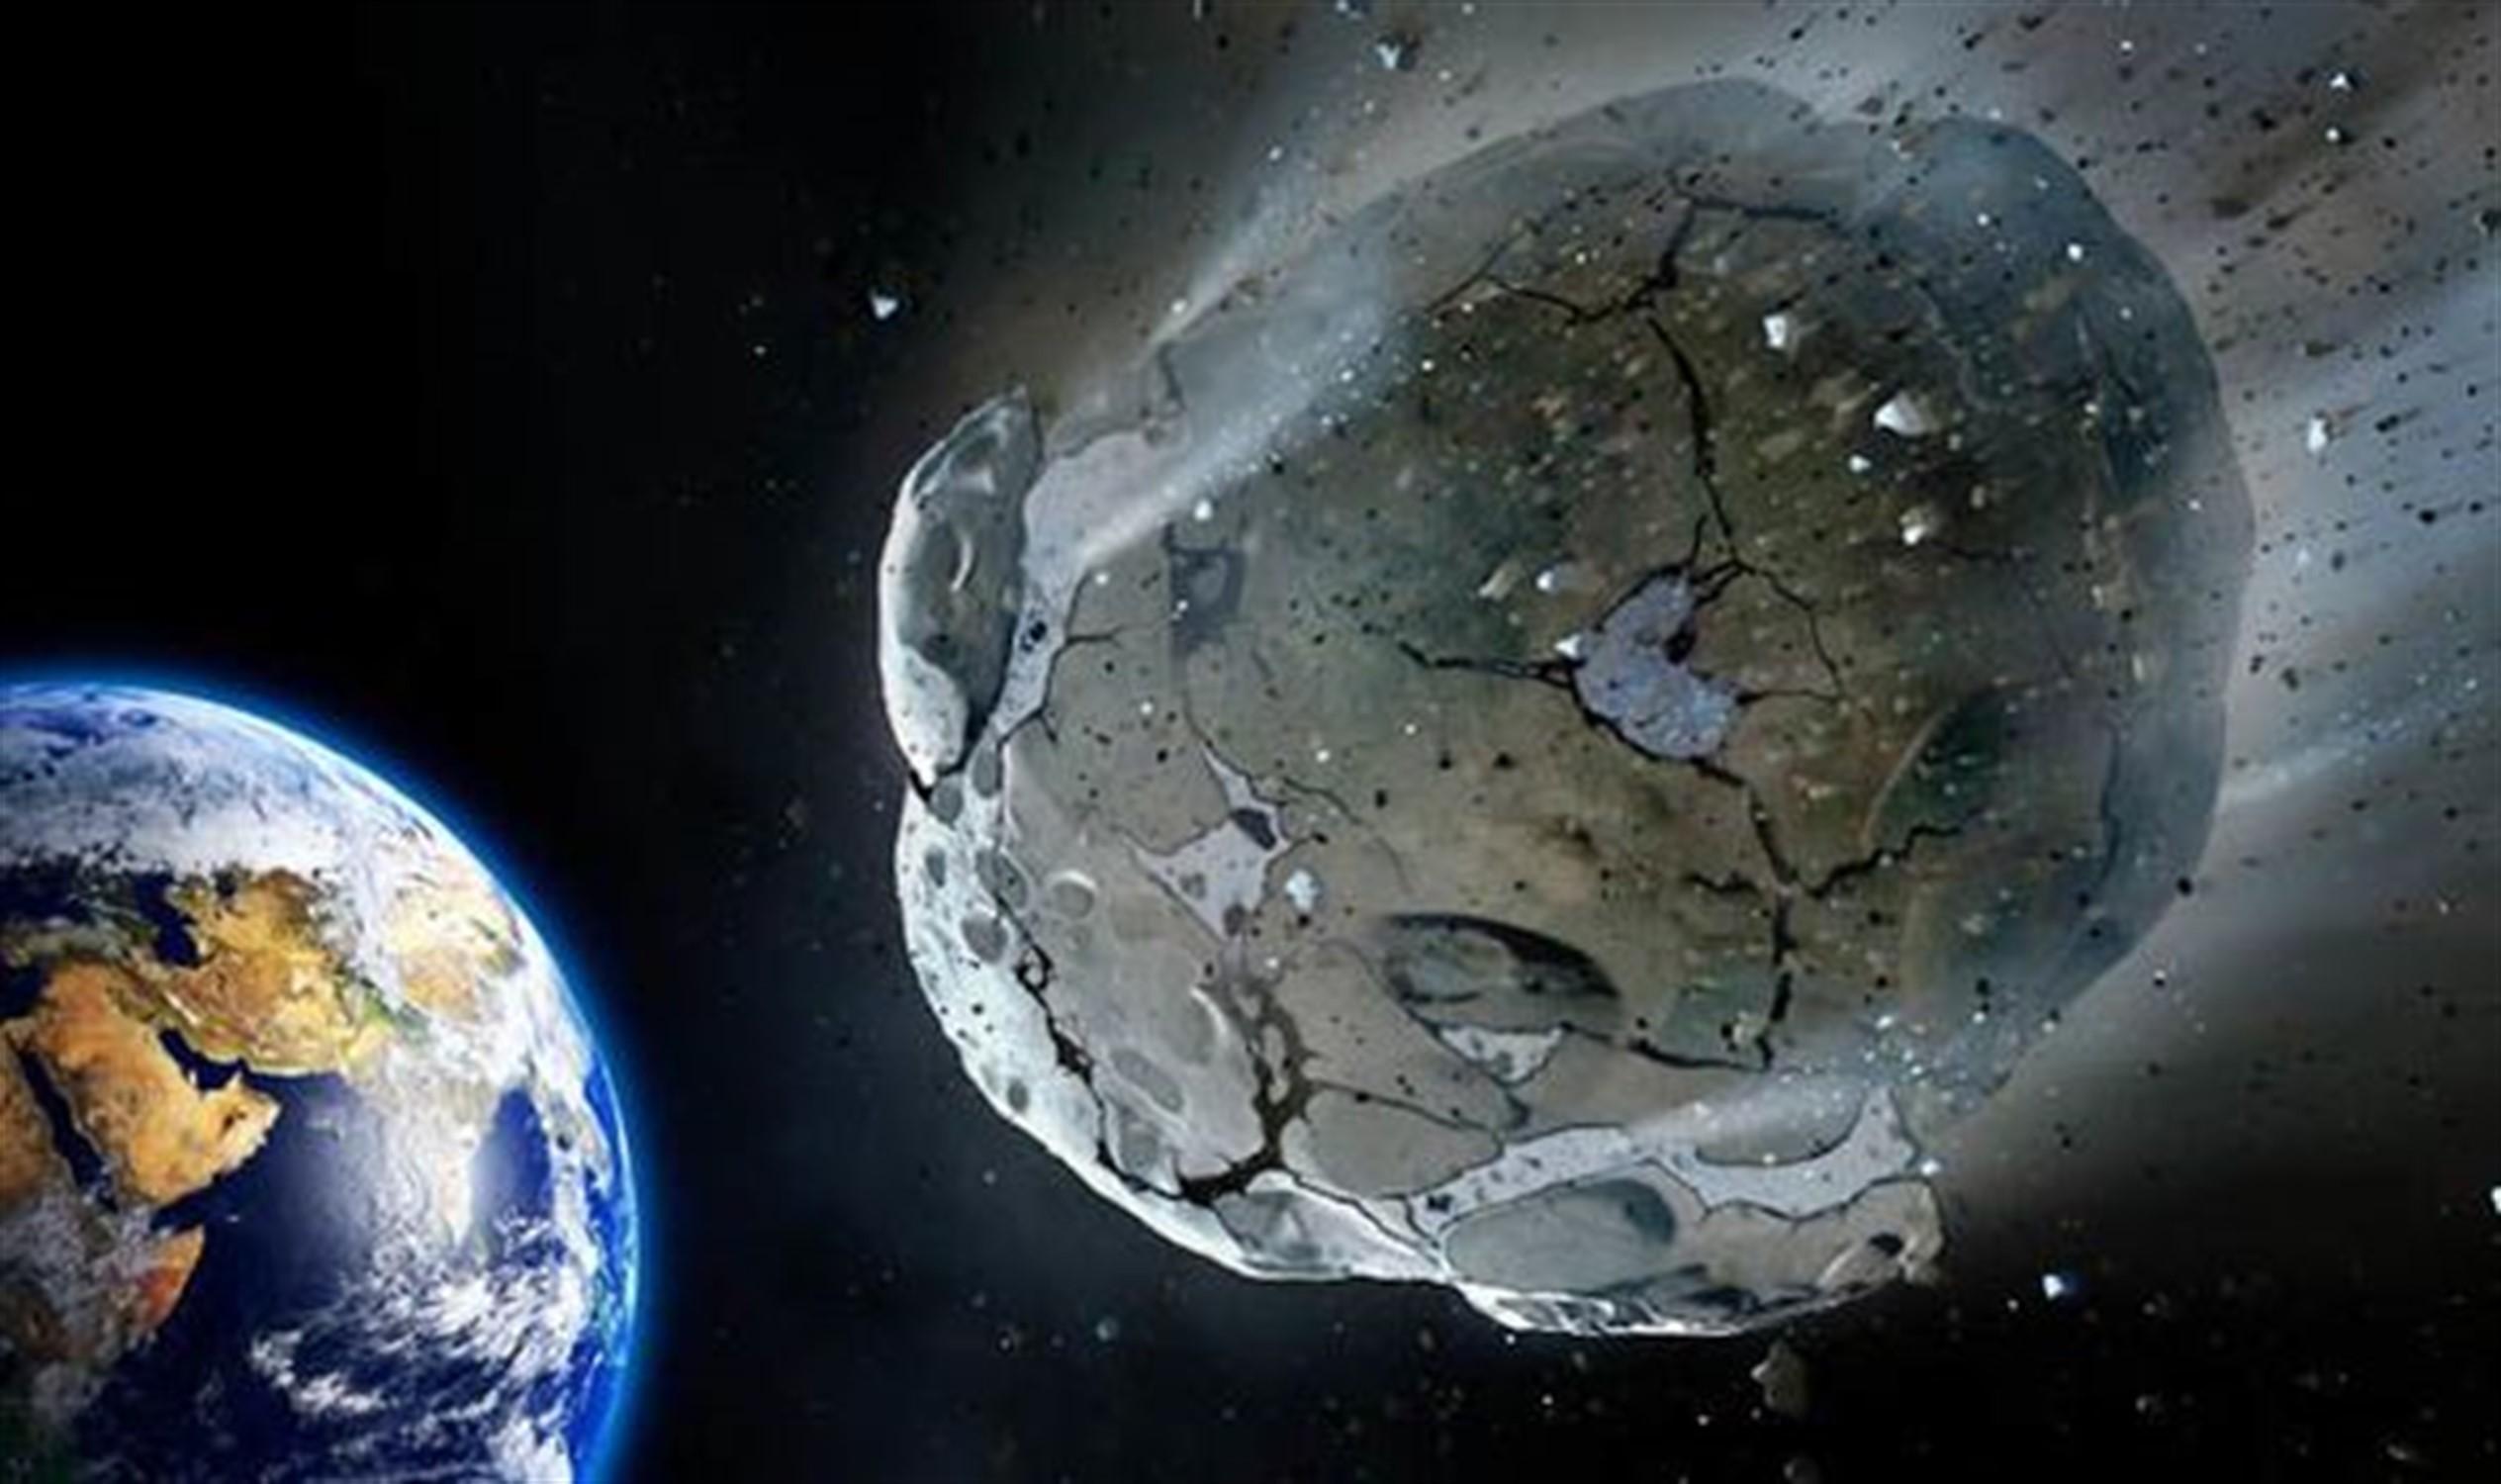 nasa asteroid tracker - HD2528×1500